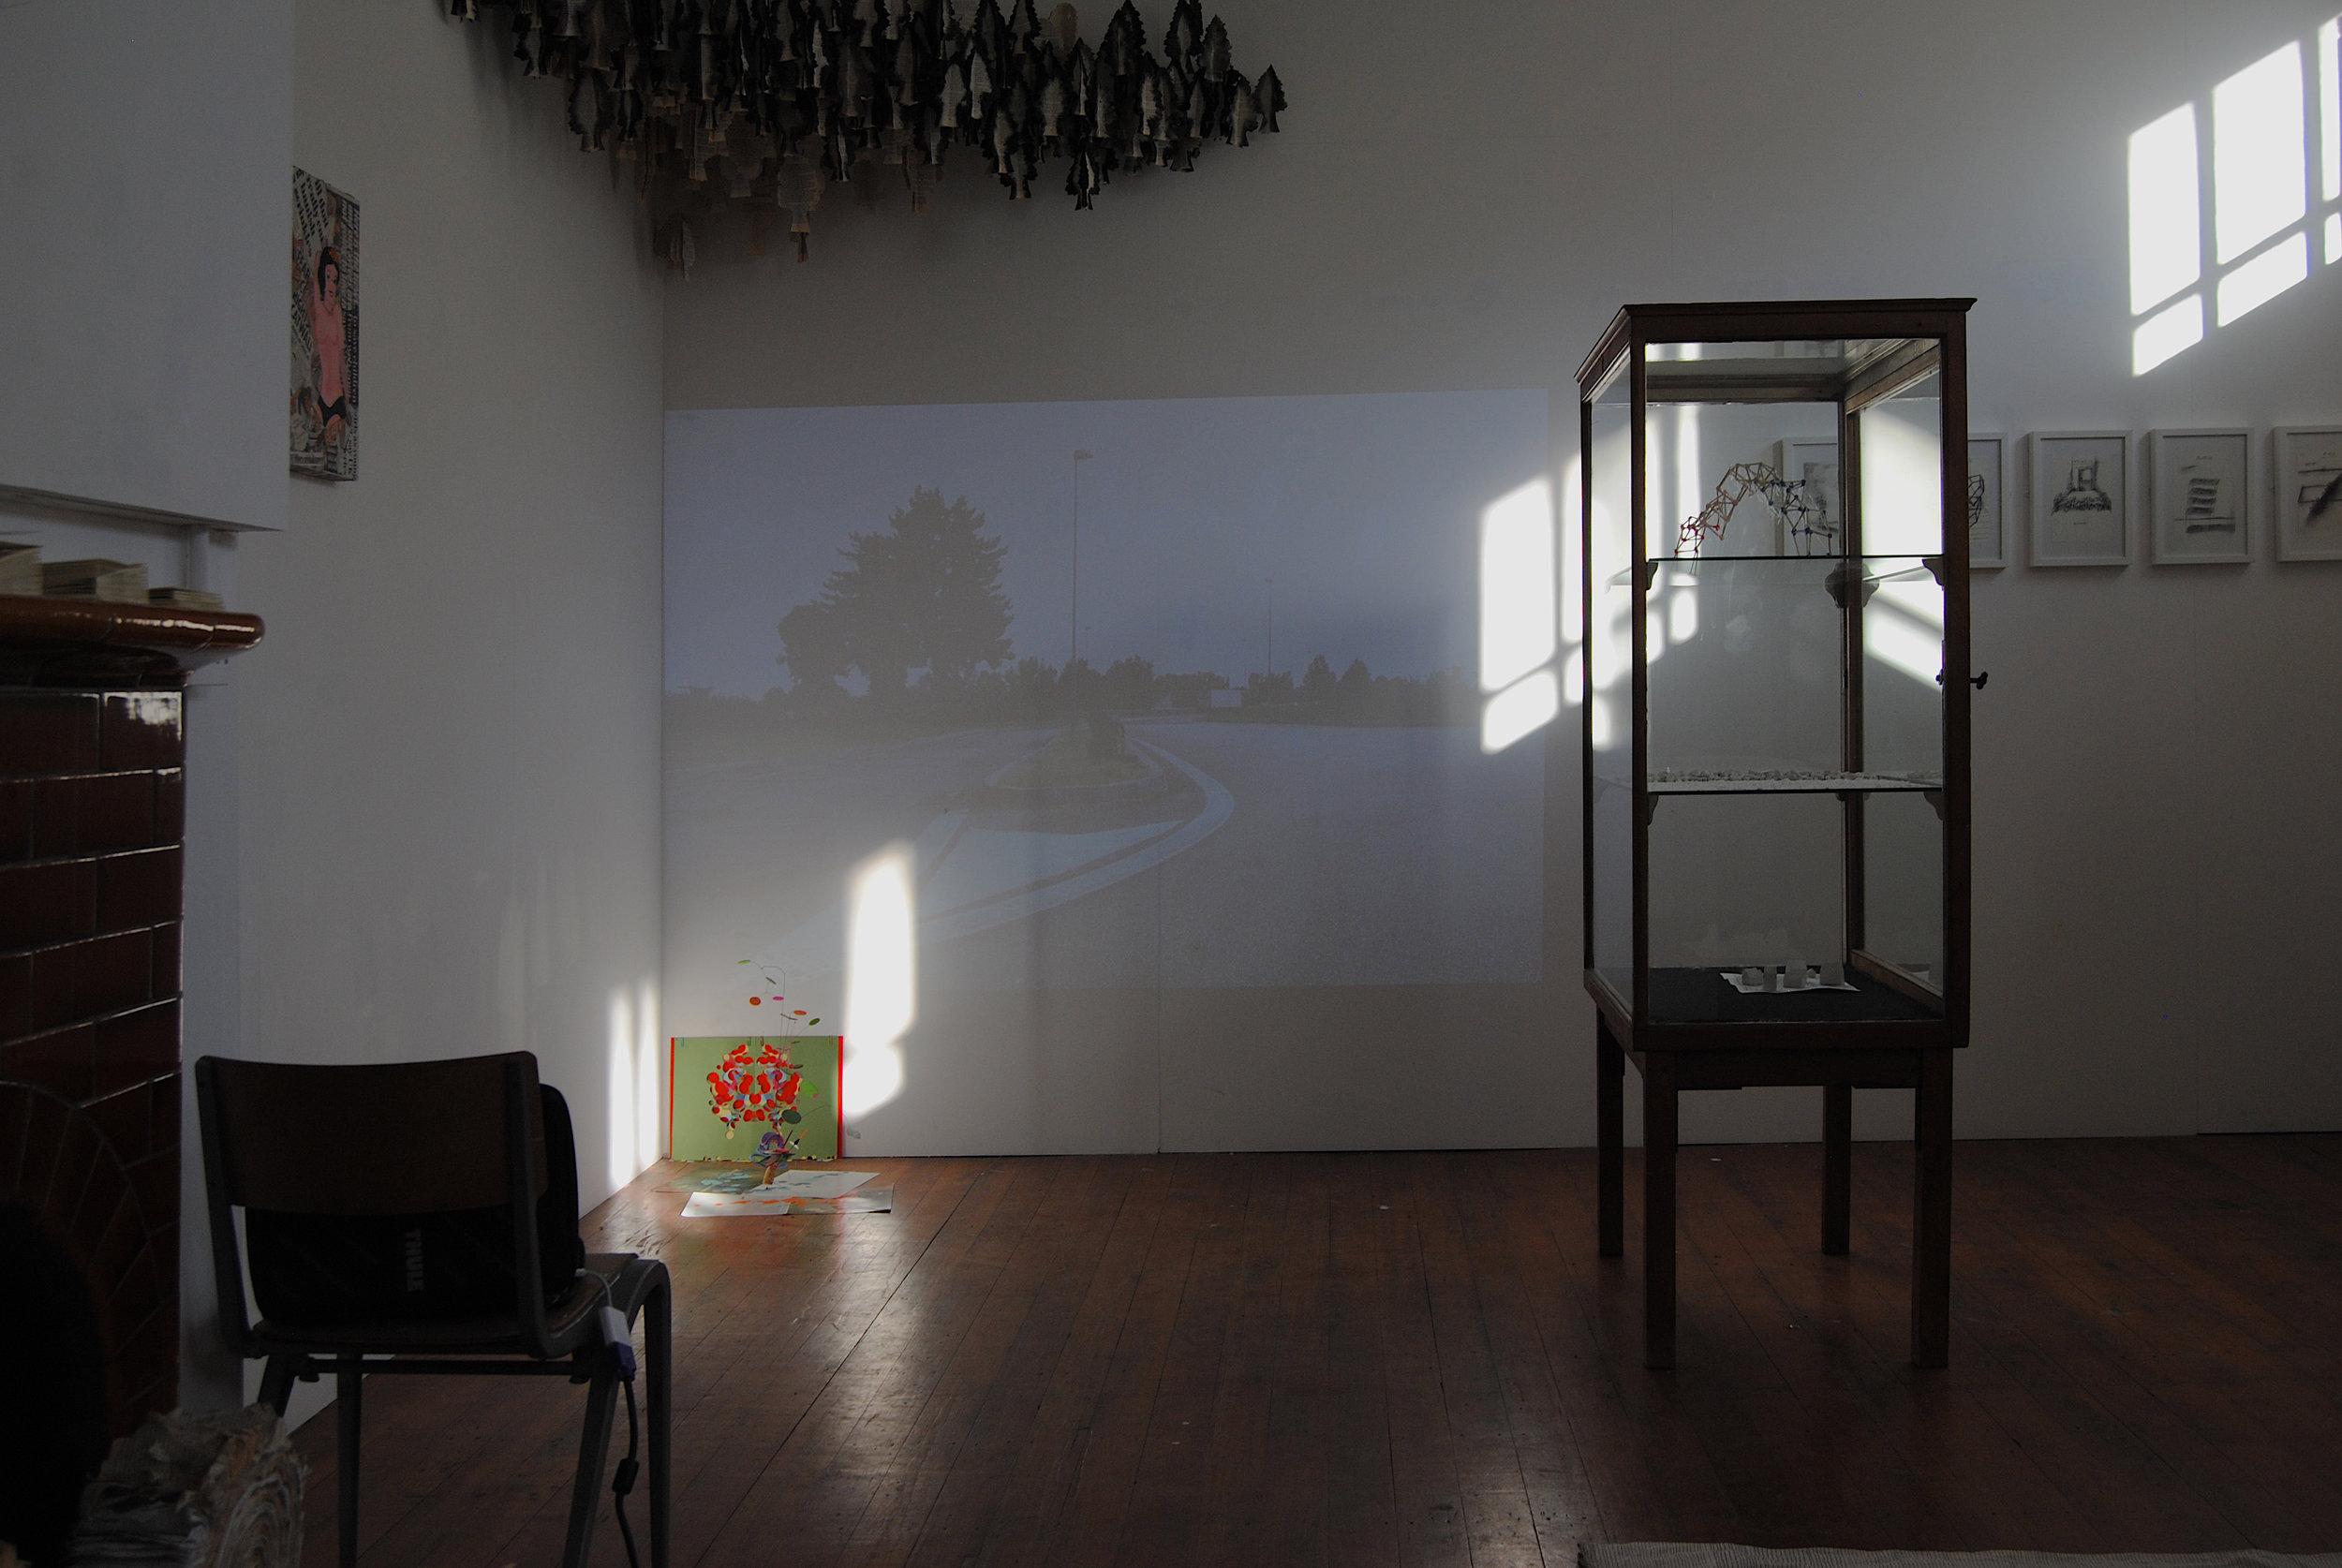 INHOSPITABLE | Liverpool Biennial |October 2012